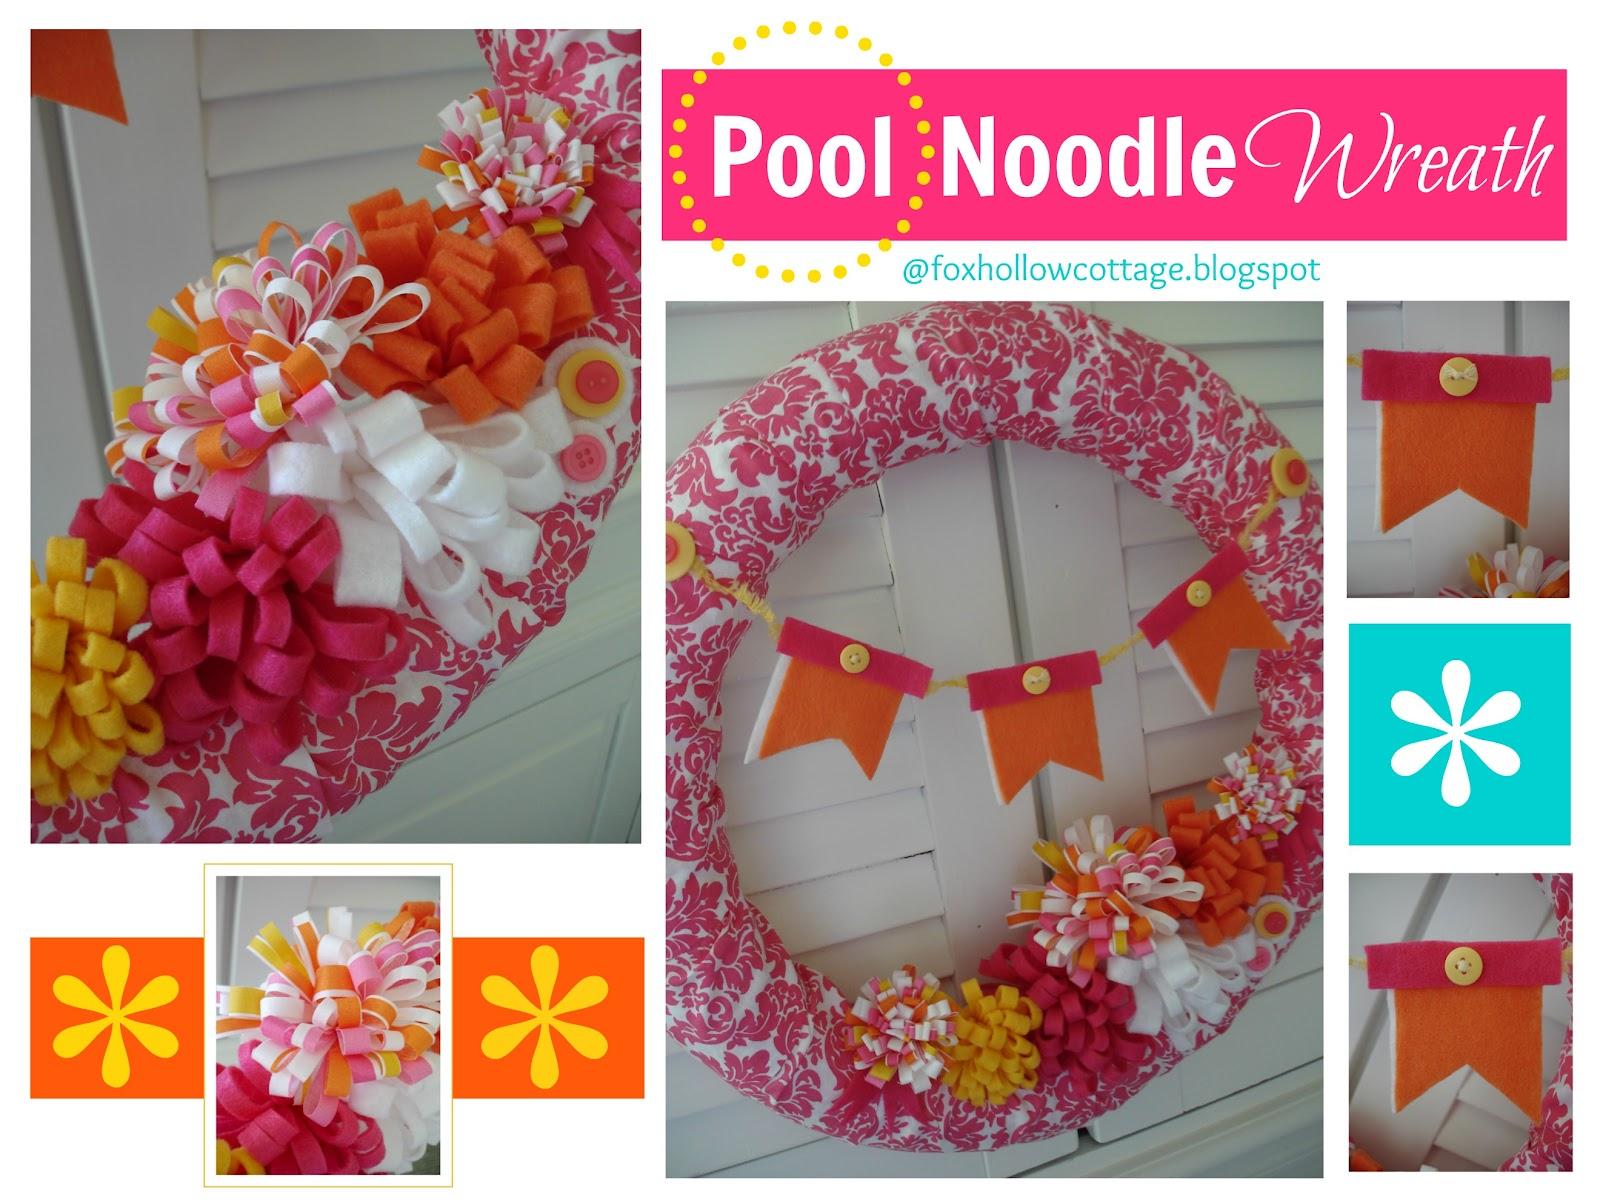 http://3.bp.blogspot.com/-XsrkYabq1LM/UAnKfa9AhTI/AAAAAAAAFBs/fXdmQ8WYKqQ/s1600/Collage+of+Pool+Noddle+Wreath+Pink+Summer+by+FoxHollowCottage.jpg